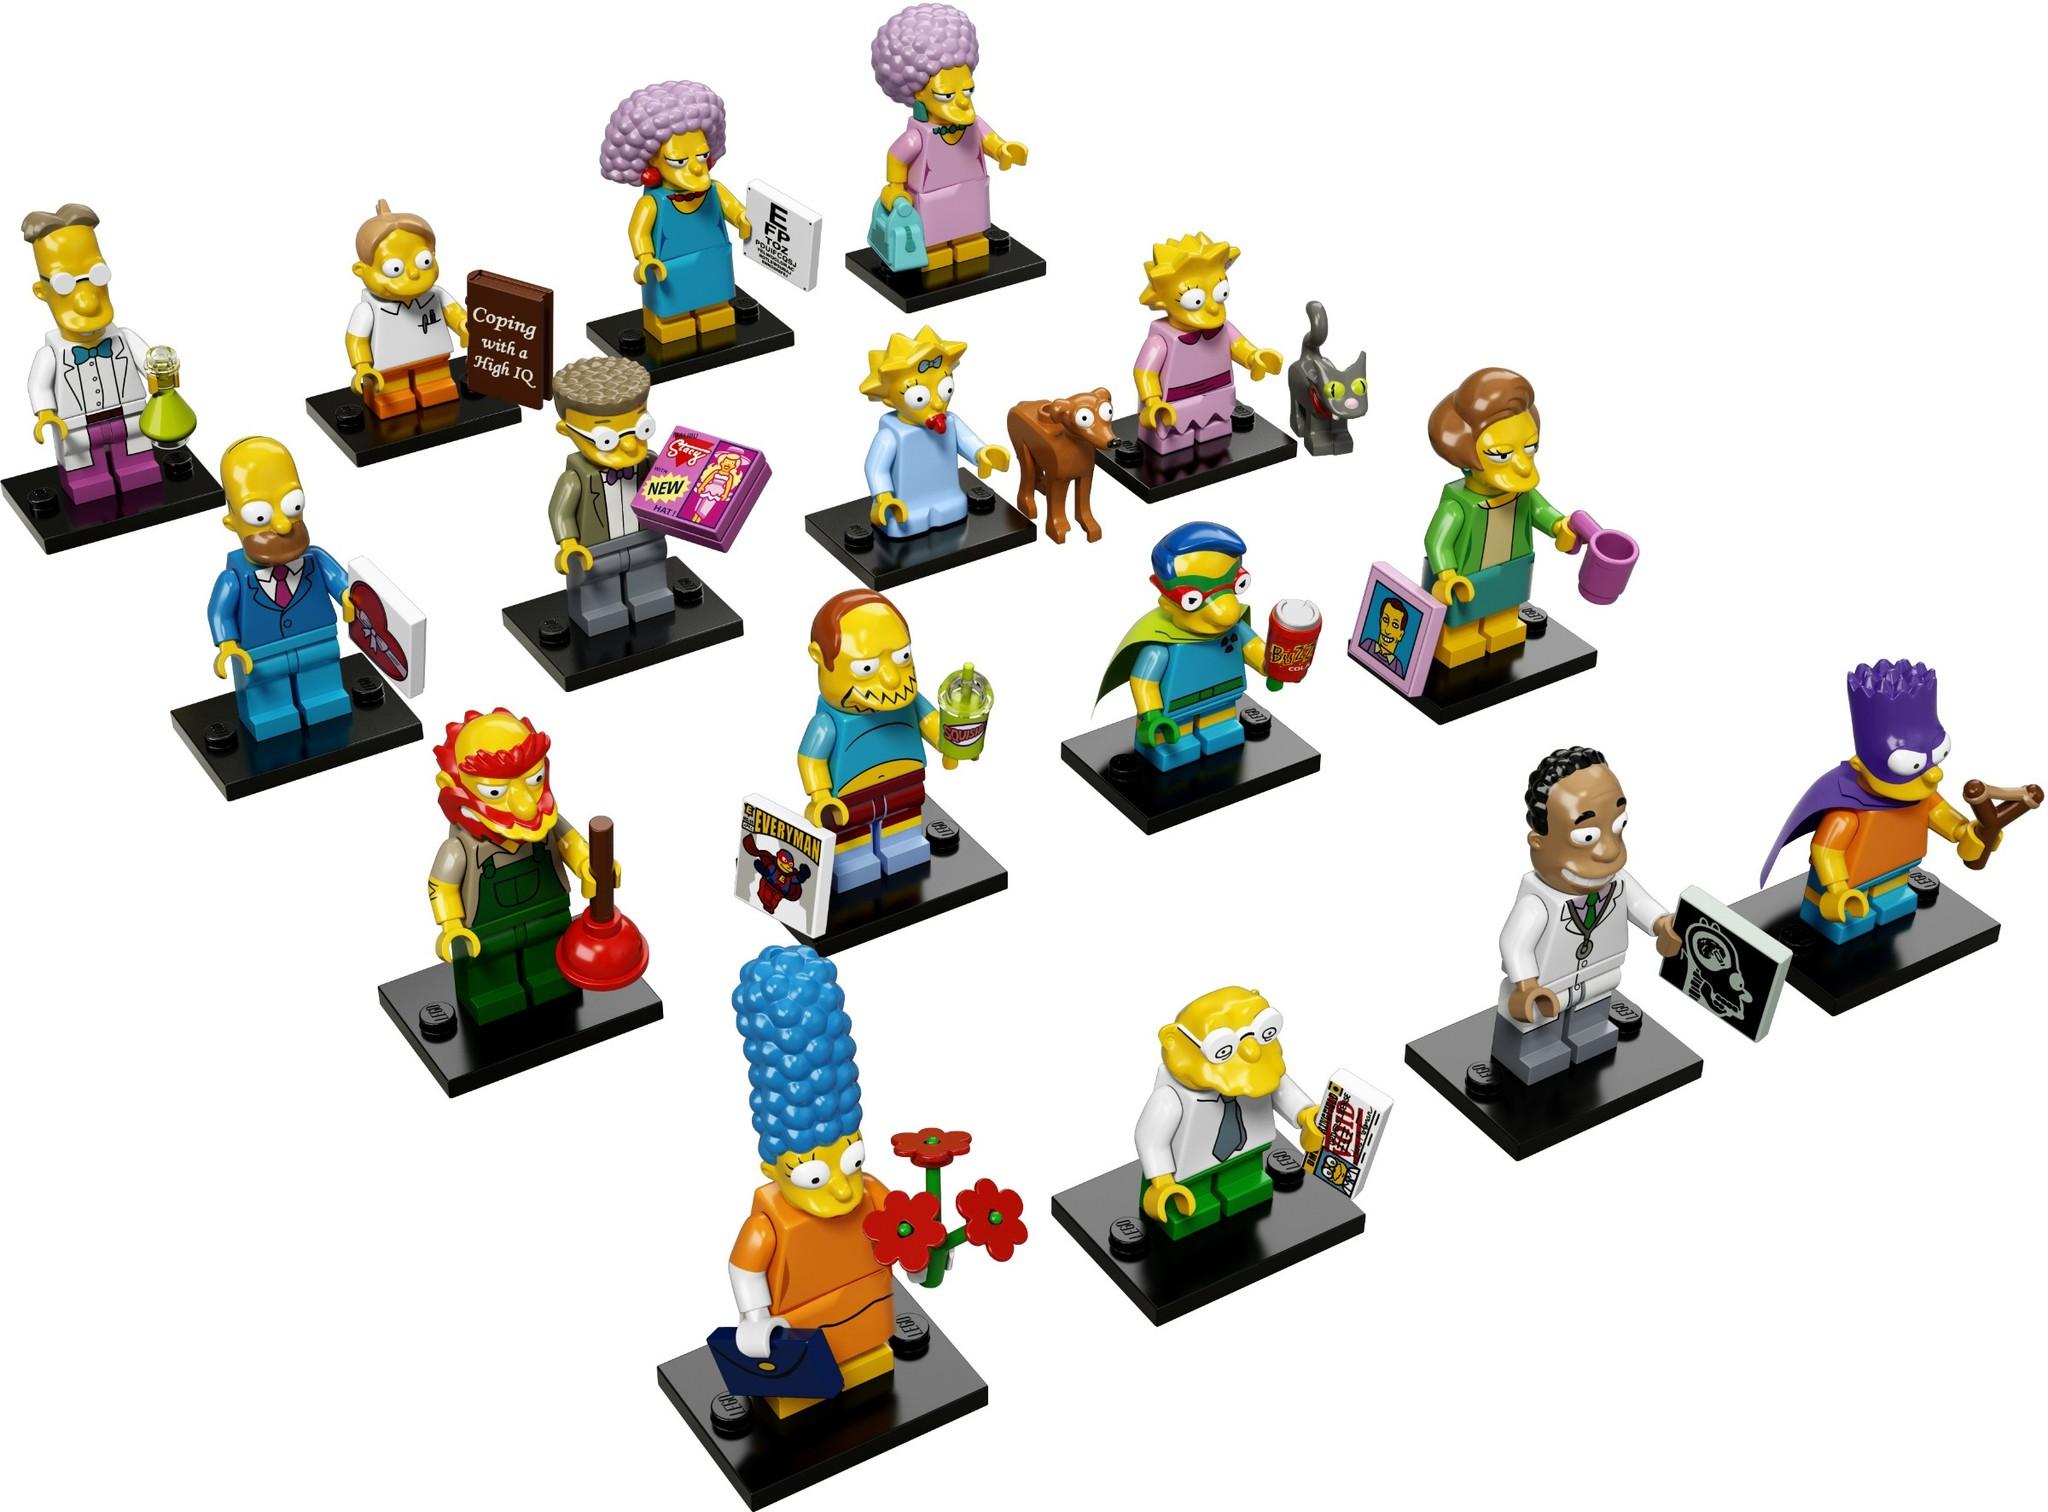 LEGO 71009 - LEGO Simpsons Series 2 Complete Full Set (16 pcs) MISP